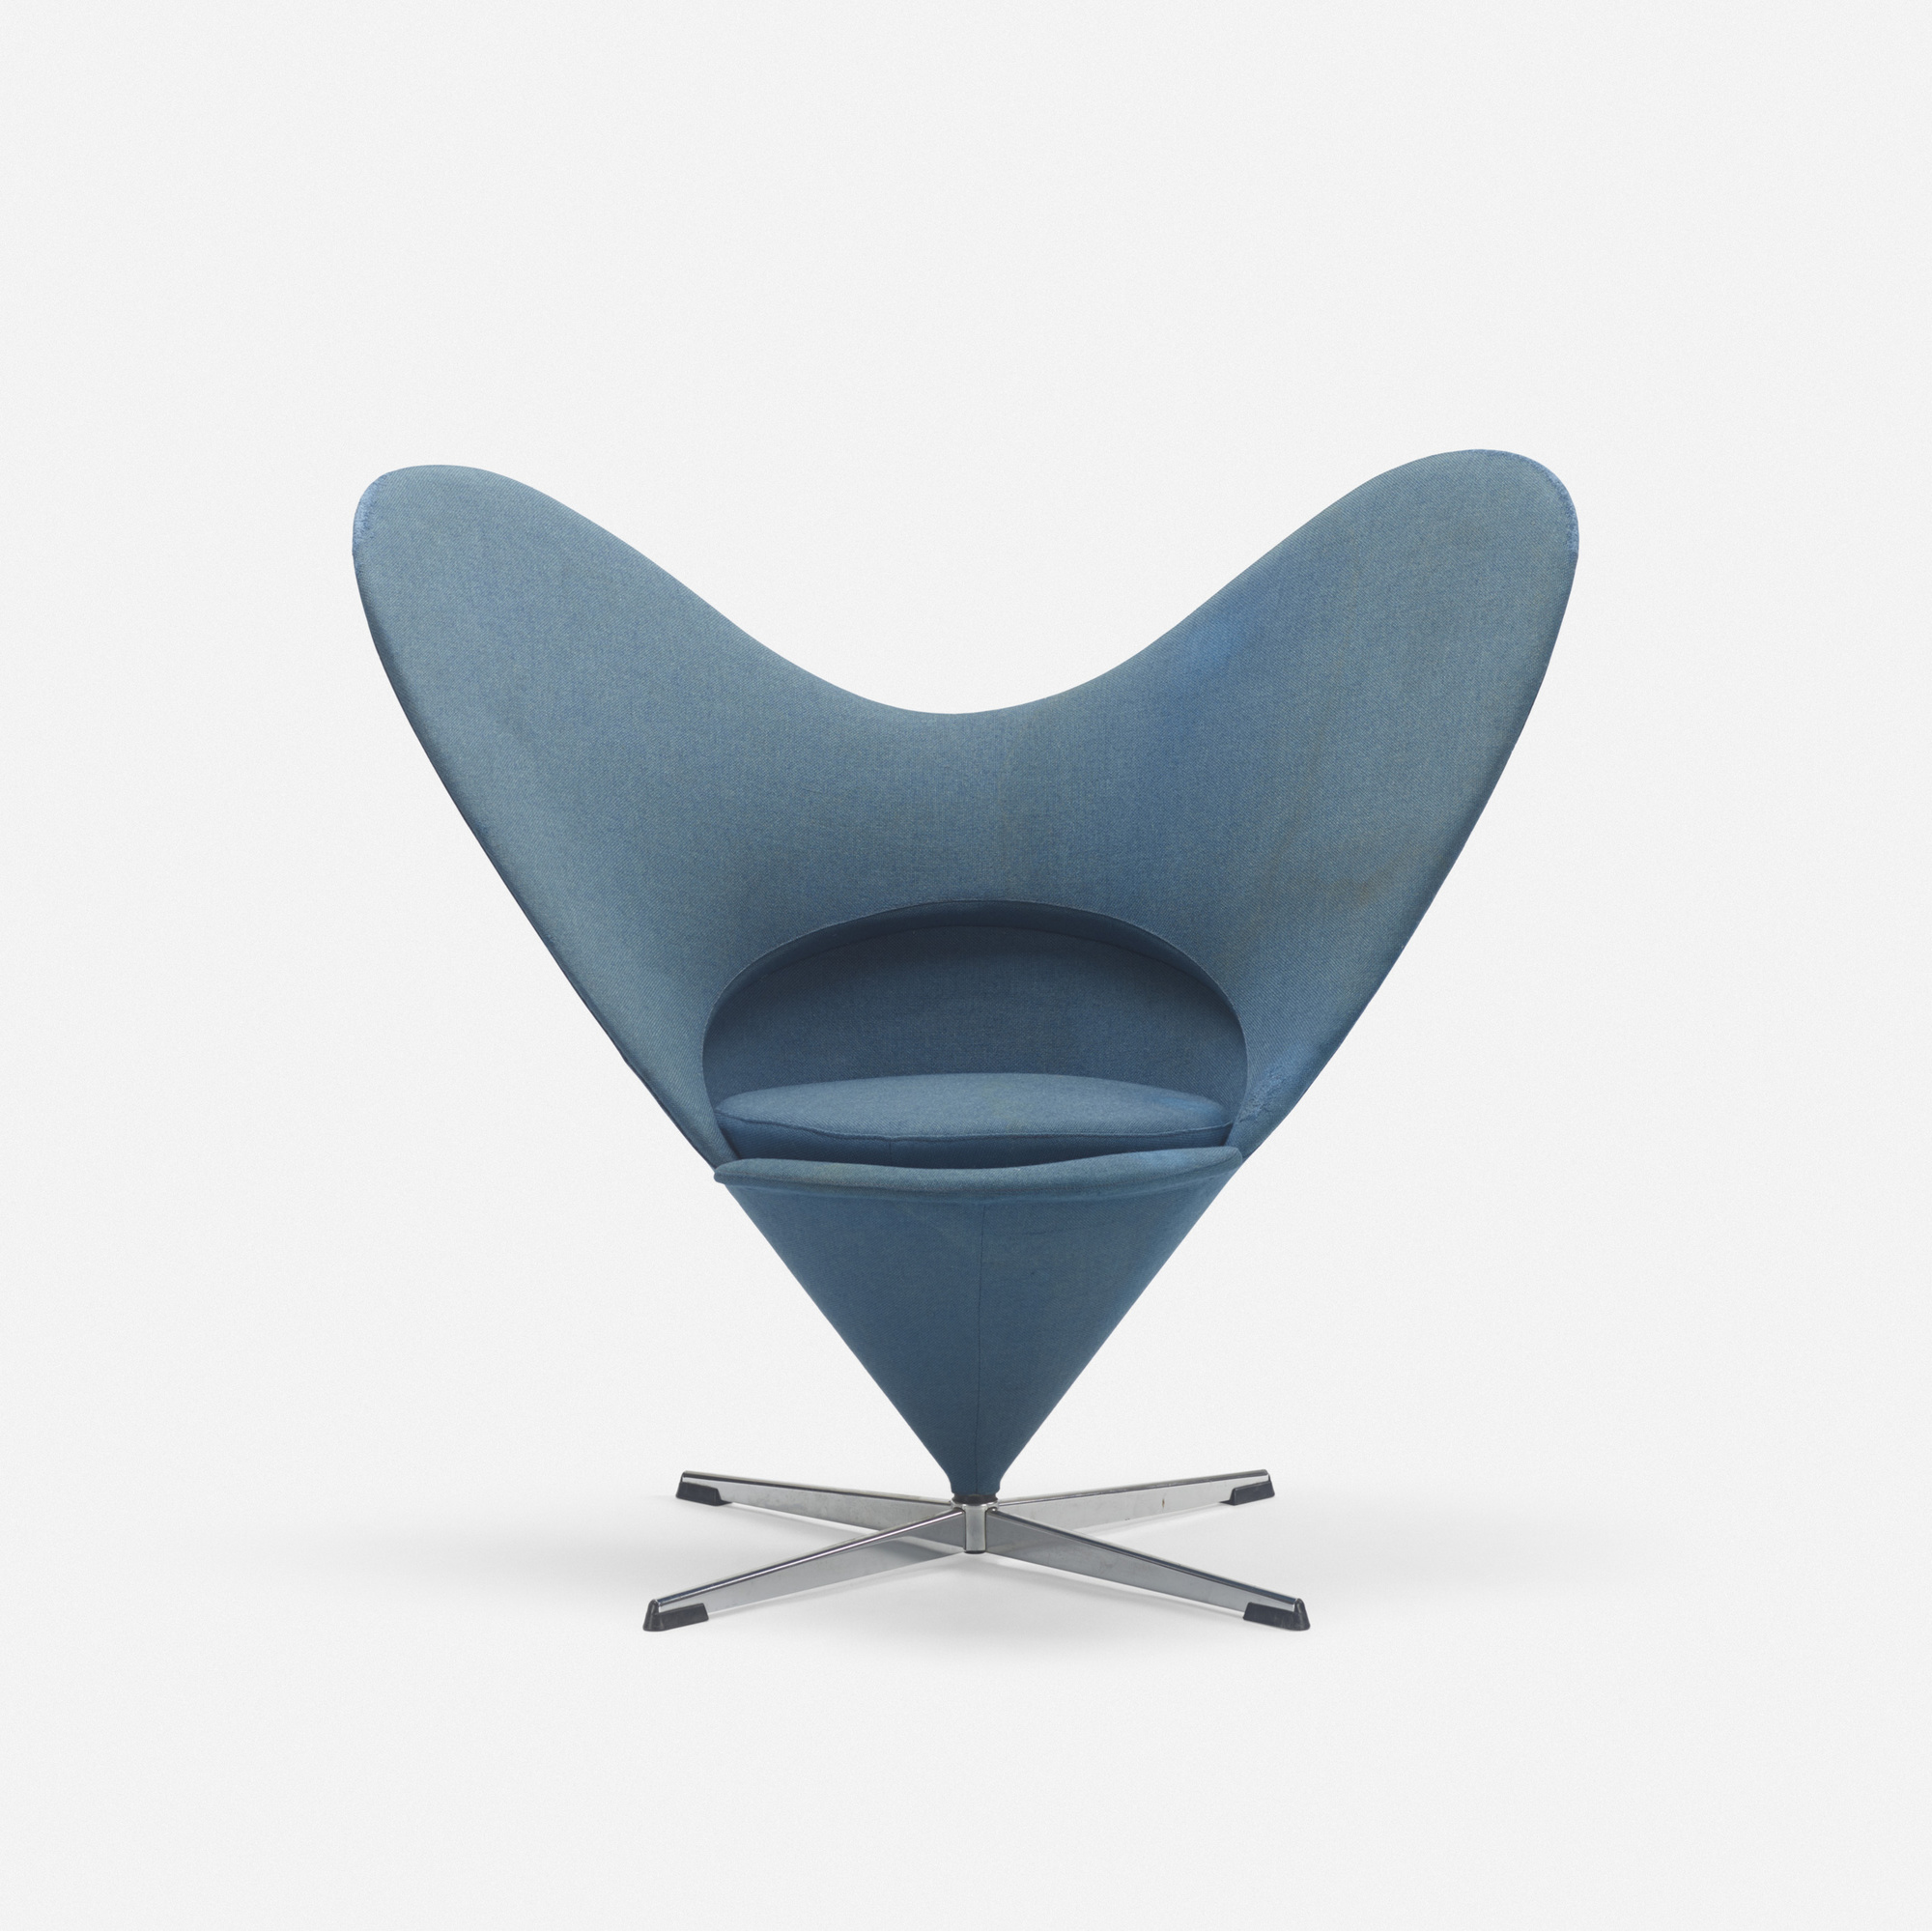 322: Verner Panton / Heart Cone chair (1 of 3)